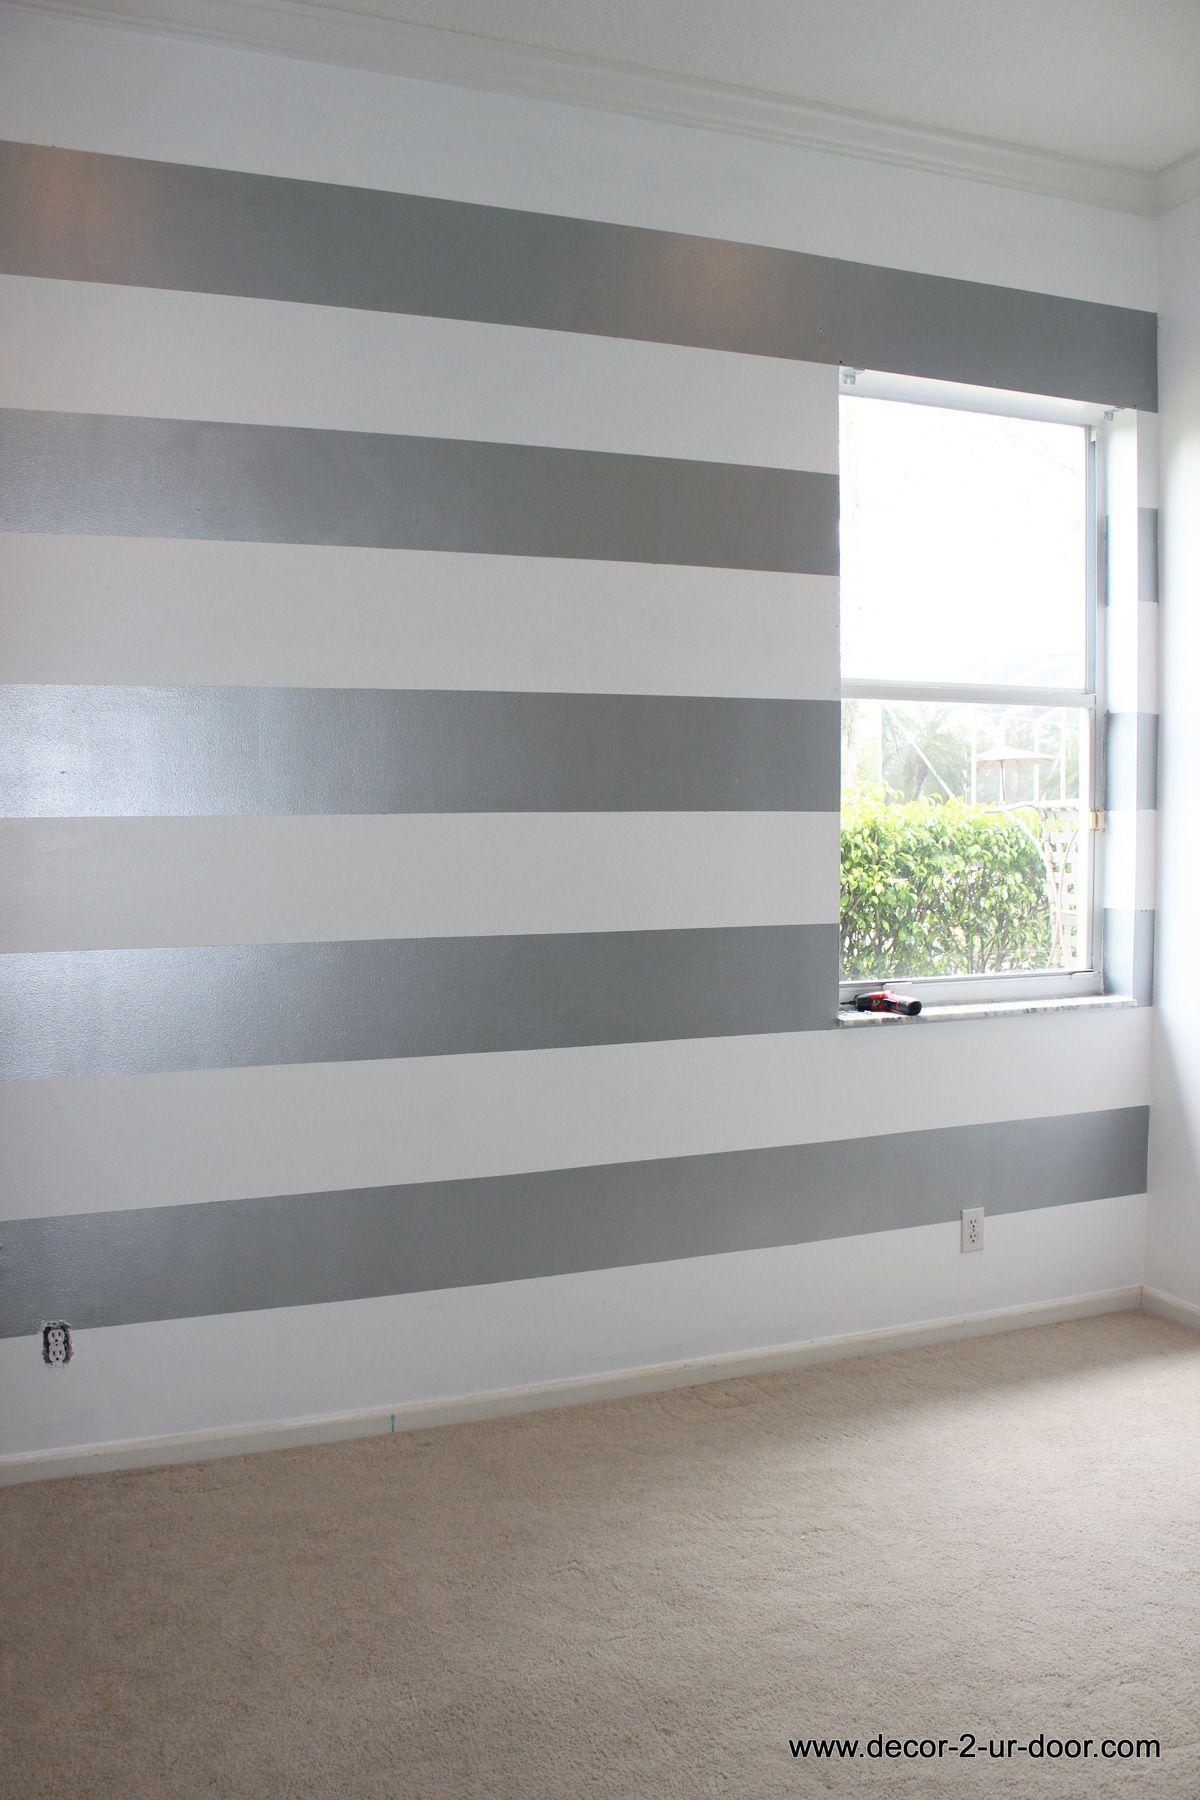 Metallic Striped Accent Wall